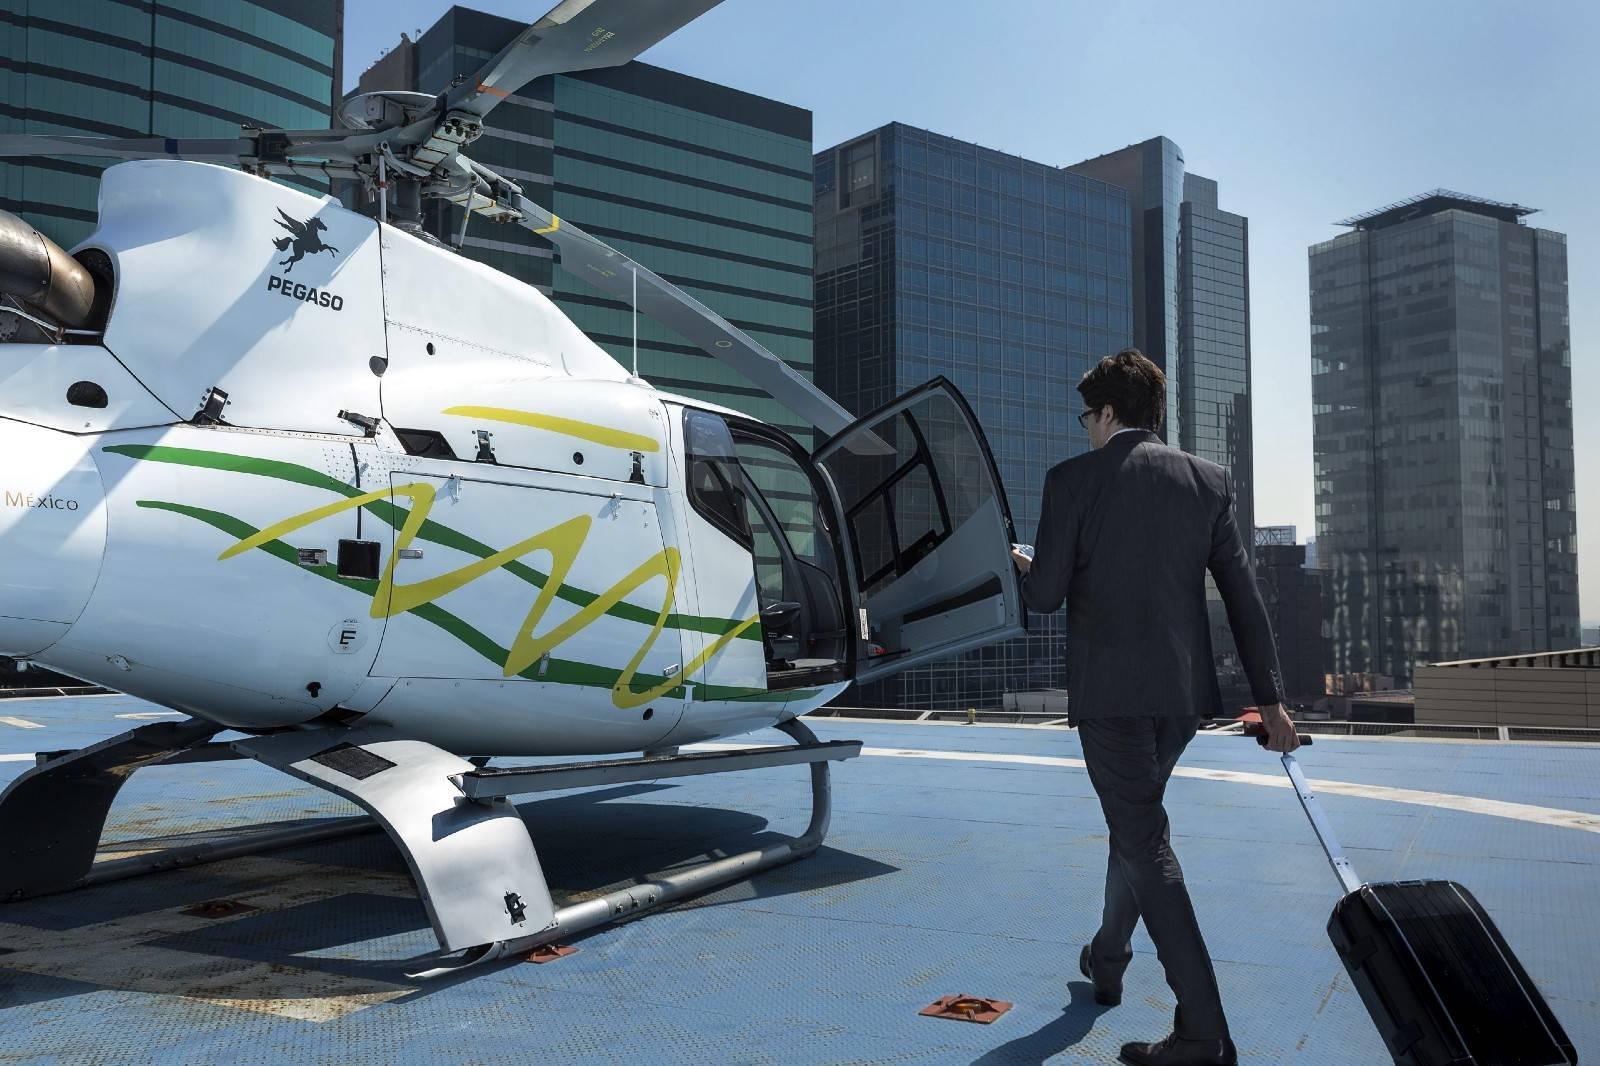 Vuelos en helicóptero Voom